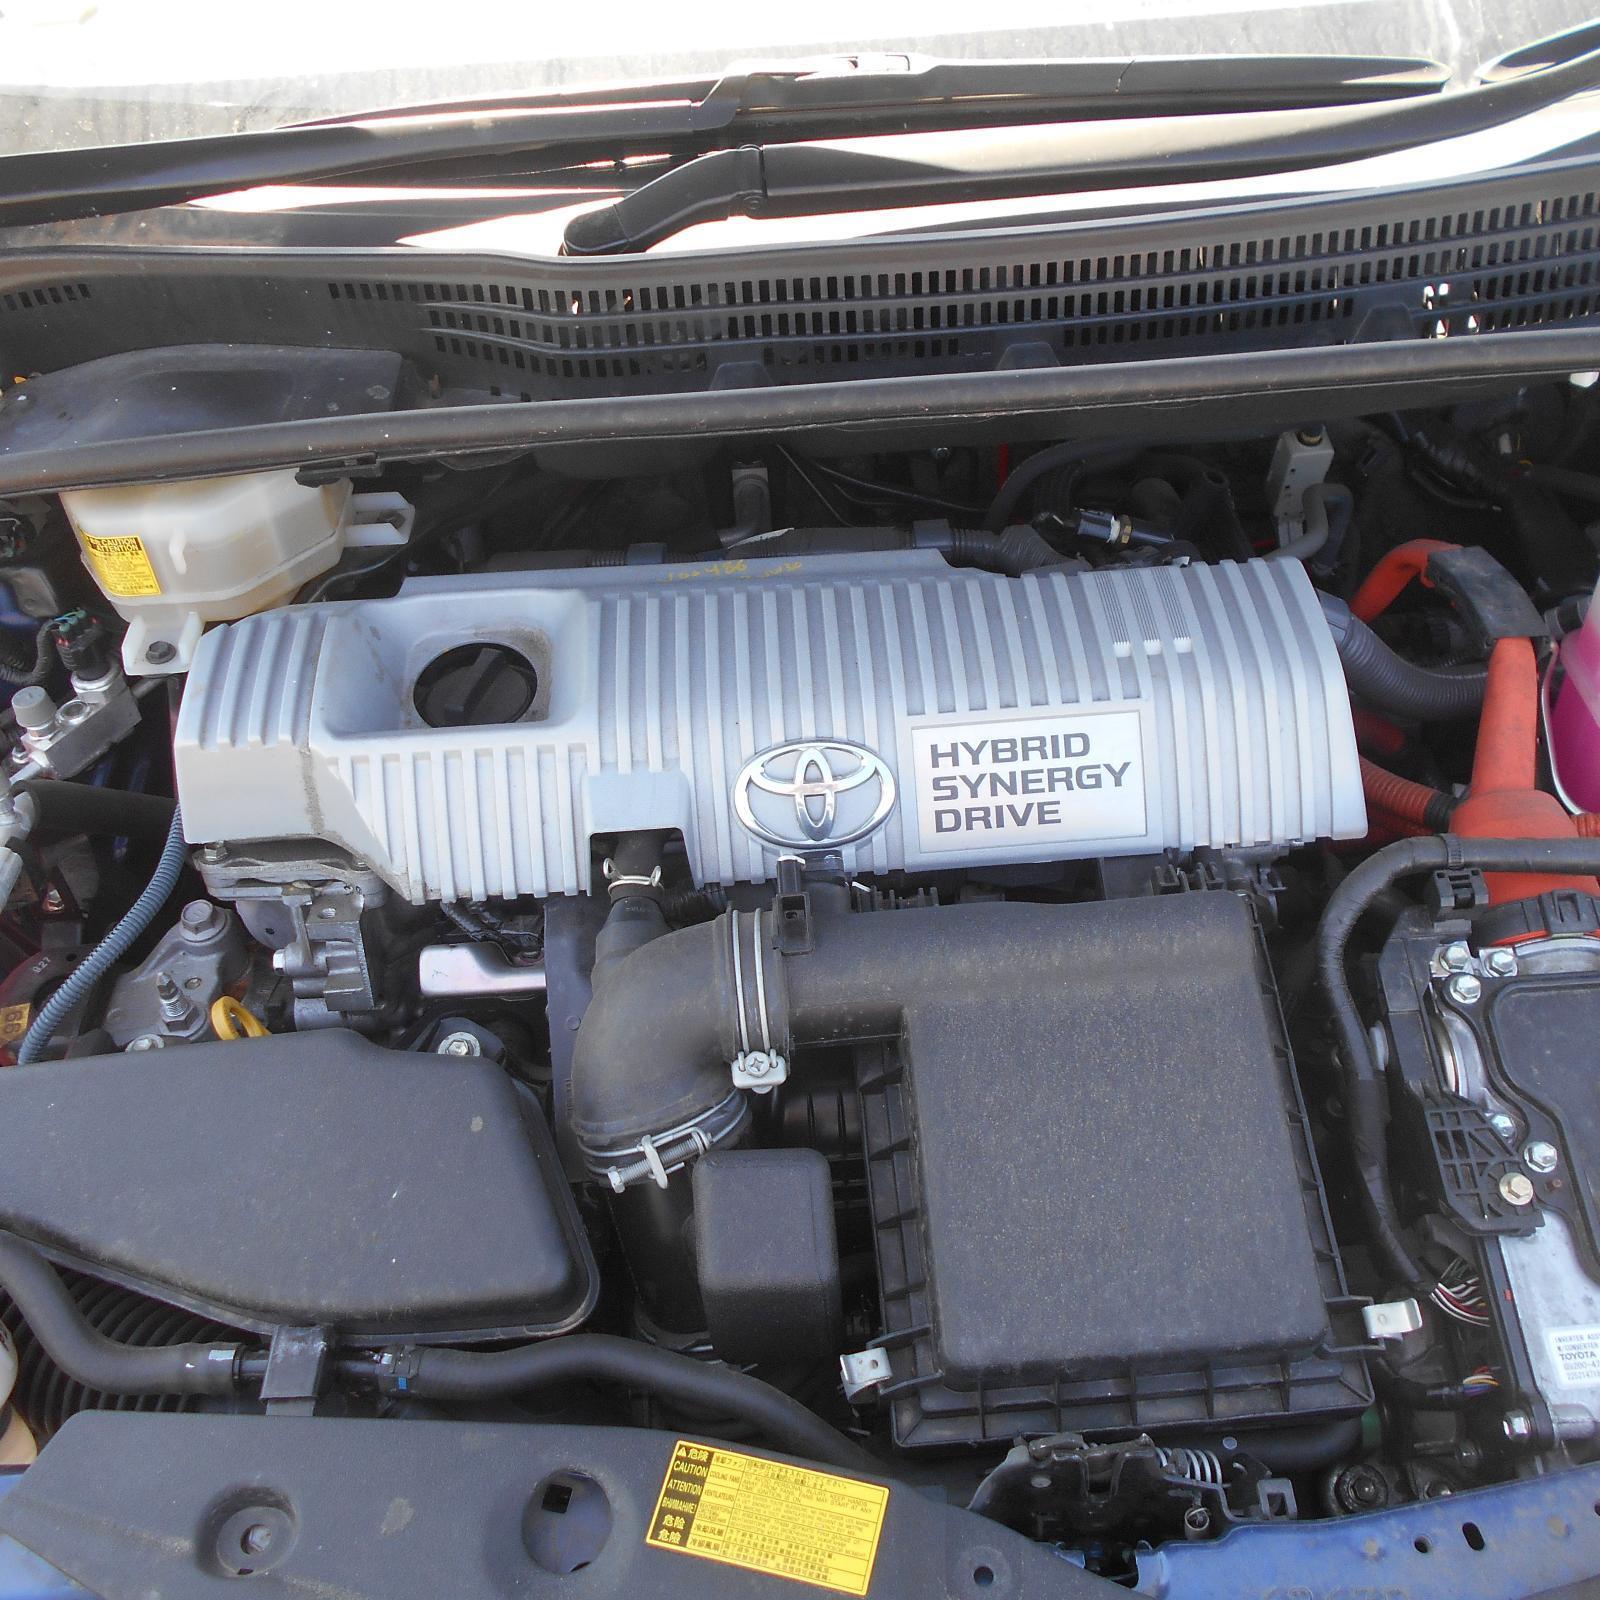 TOYOTA PRIUS, Engine, PETROL, 1.8, 2ZR-FXE, ZVW30R, 07/09-12/15